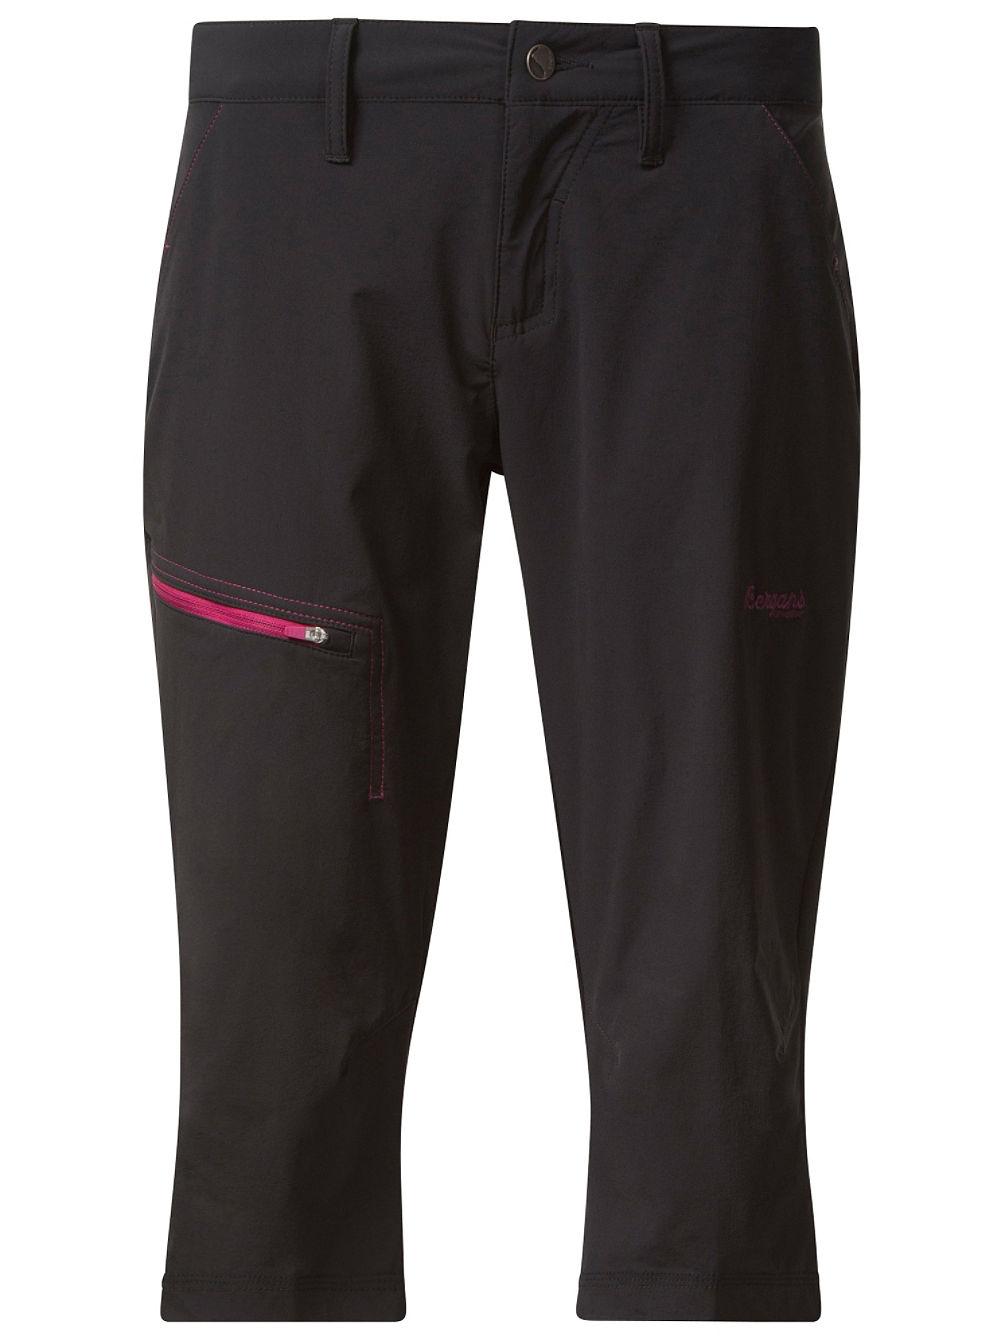 3ba8e456 Buy Bergans Moa Pirate Short Outdoor Pants online at Blue Tomato